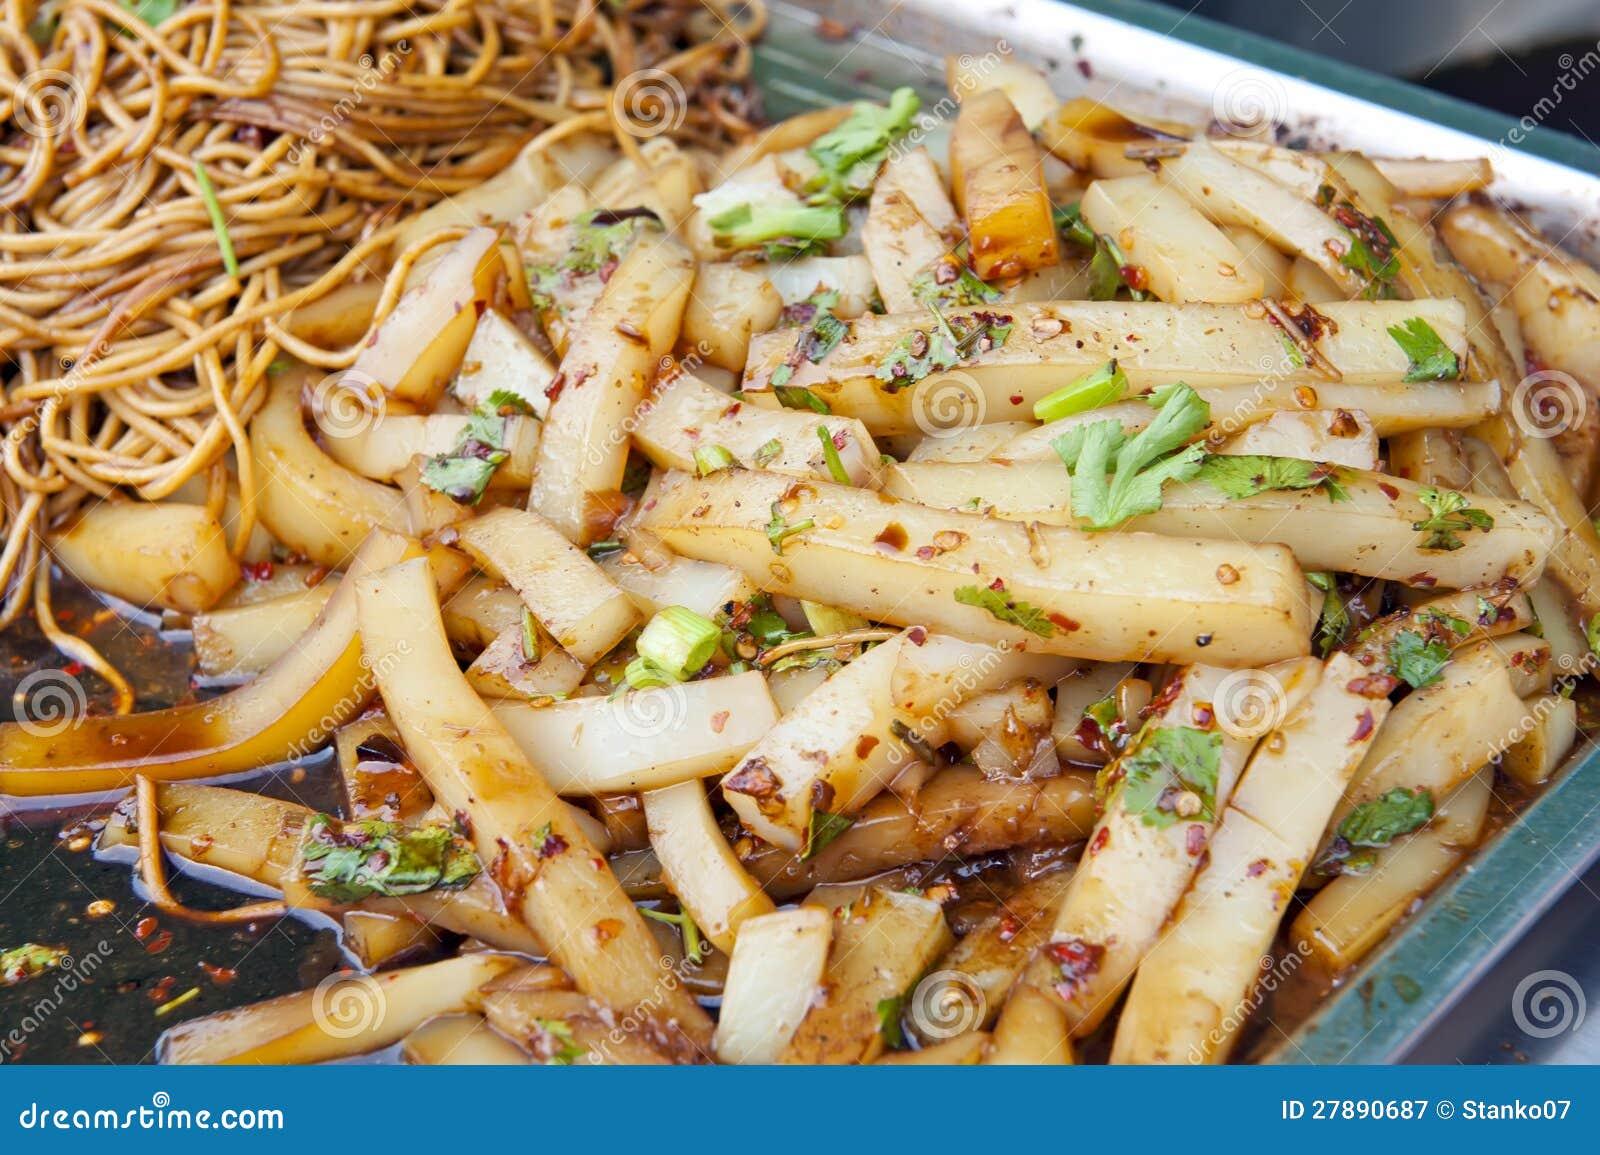 Chinese street food in shenyang china